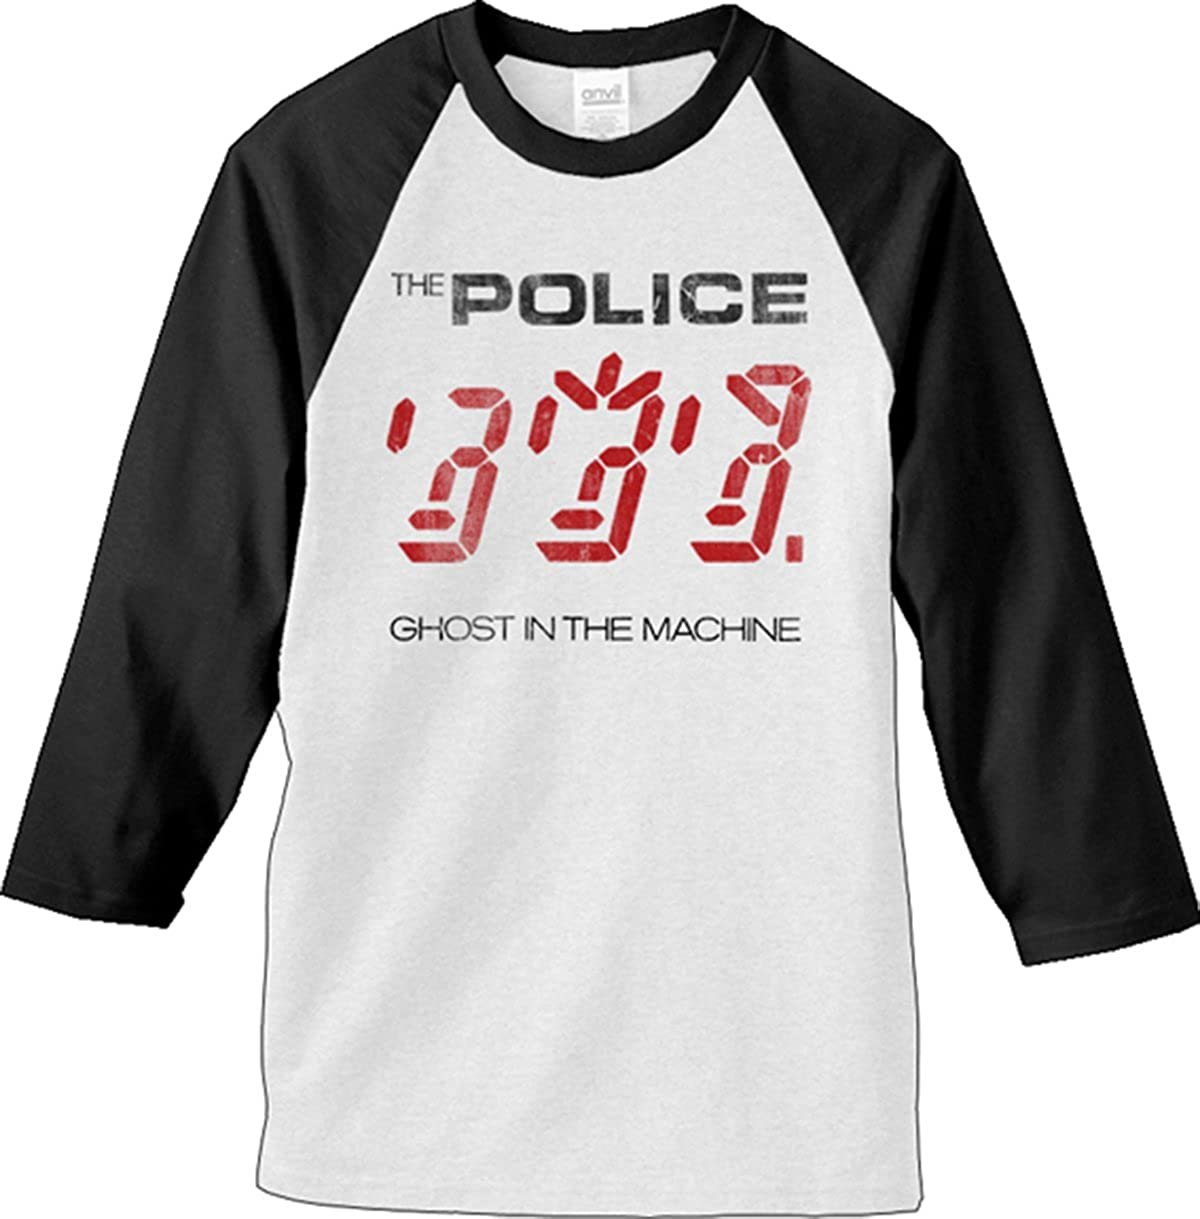 21f16ac45 Amazon.com: RockWaresUSA Police 'Ghost In The Machine' White Baseball  Jersey T-Shirt: Clothing